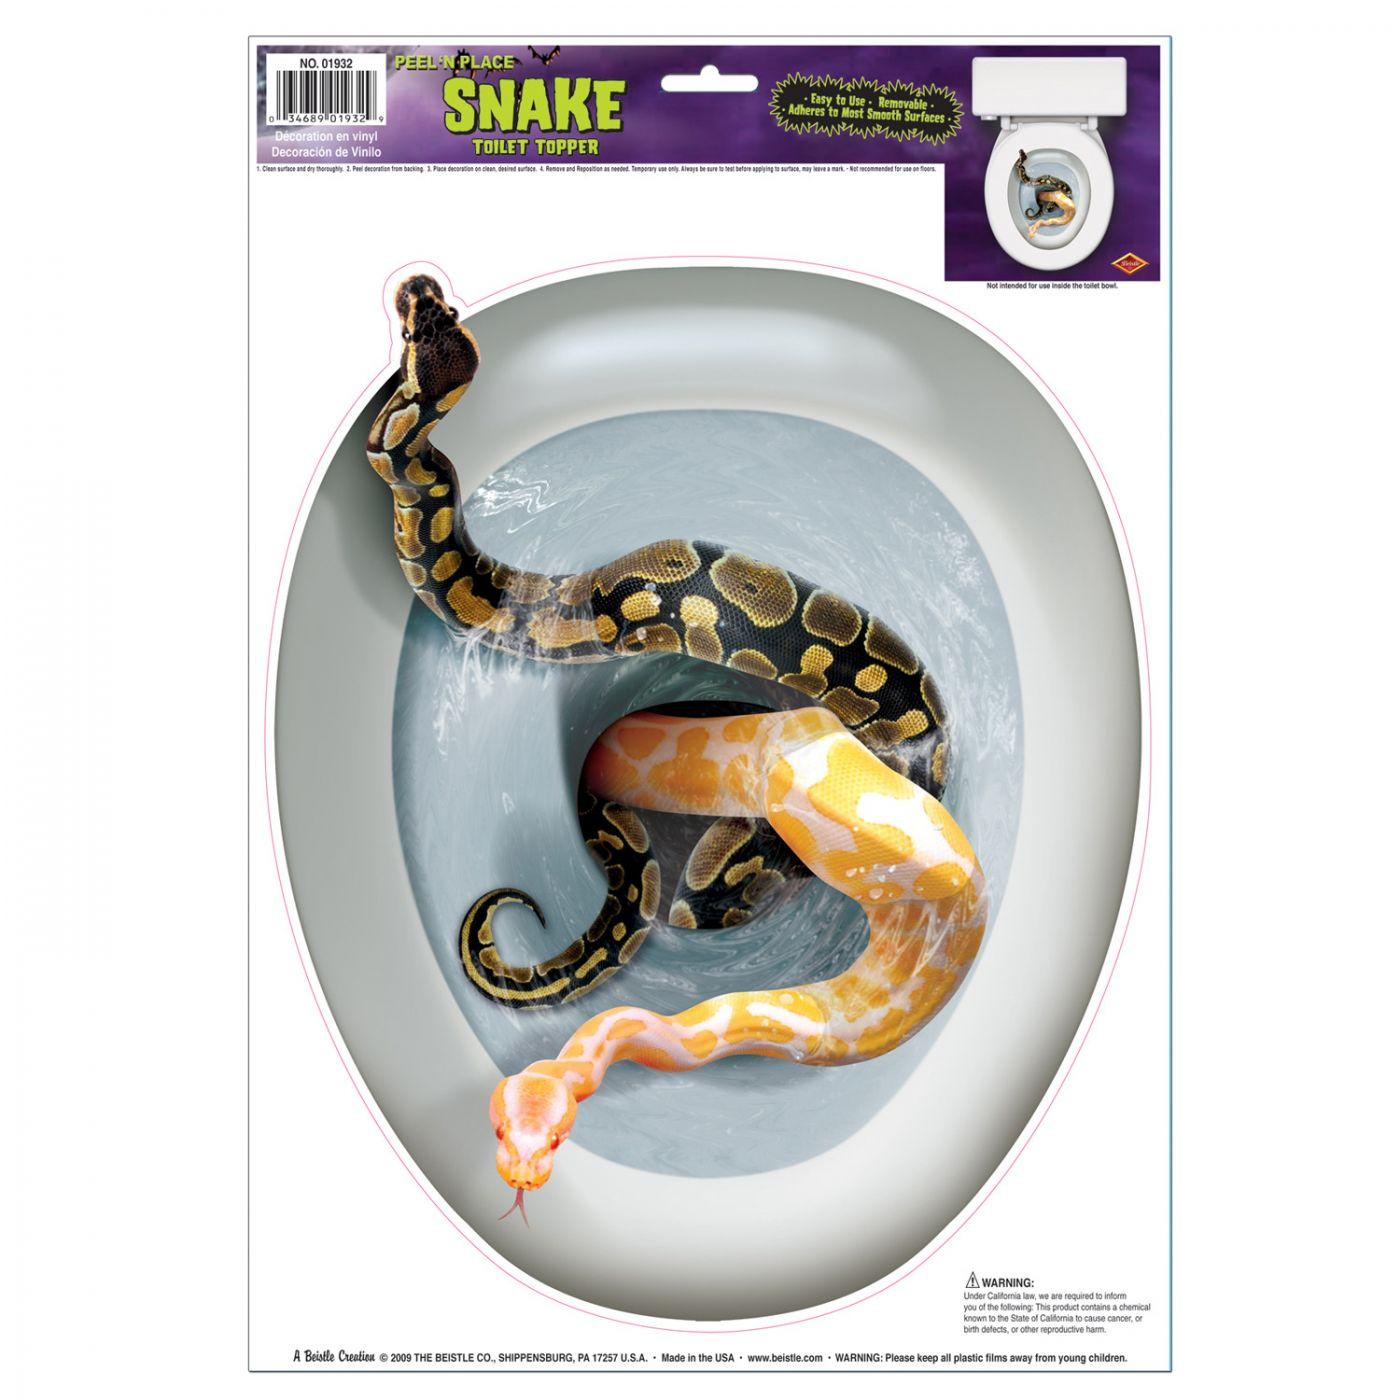 Snake Toilet Topper Peel 'N Place image